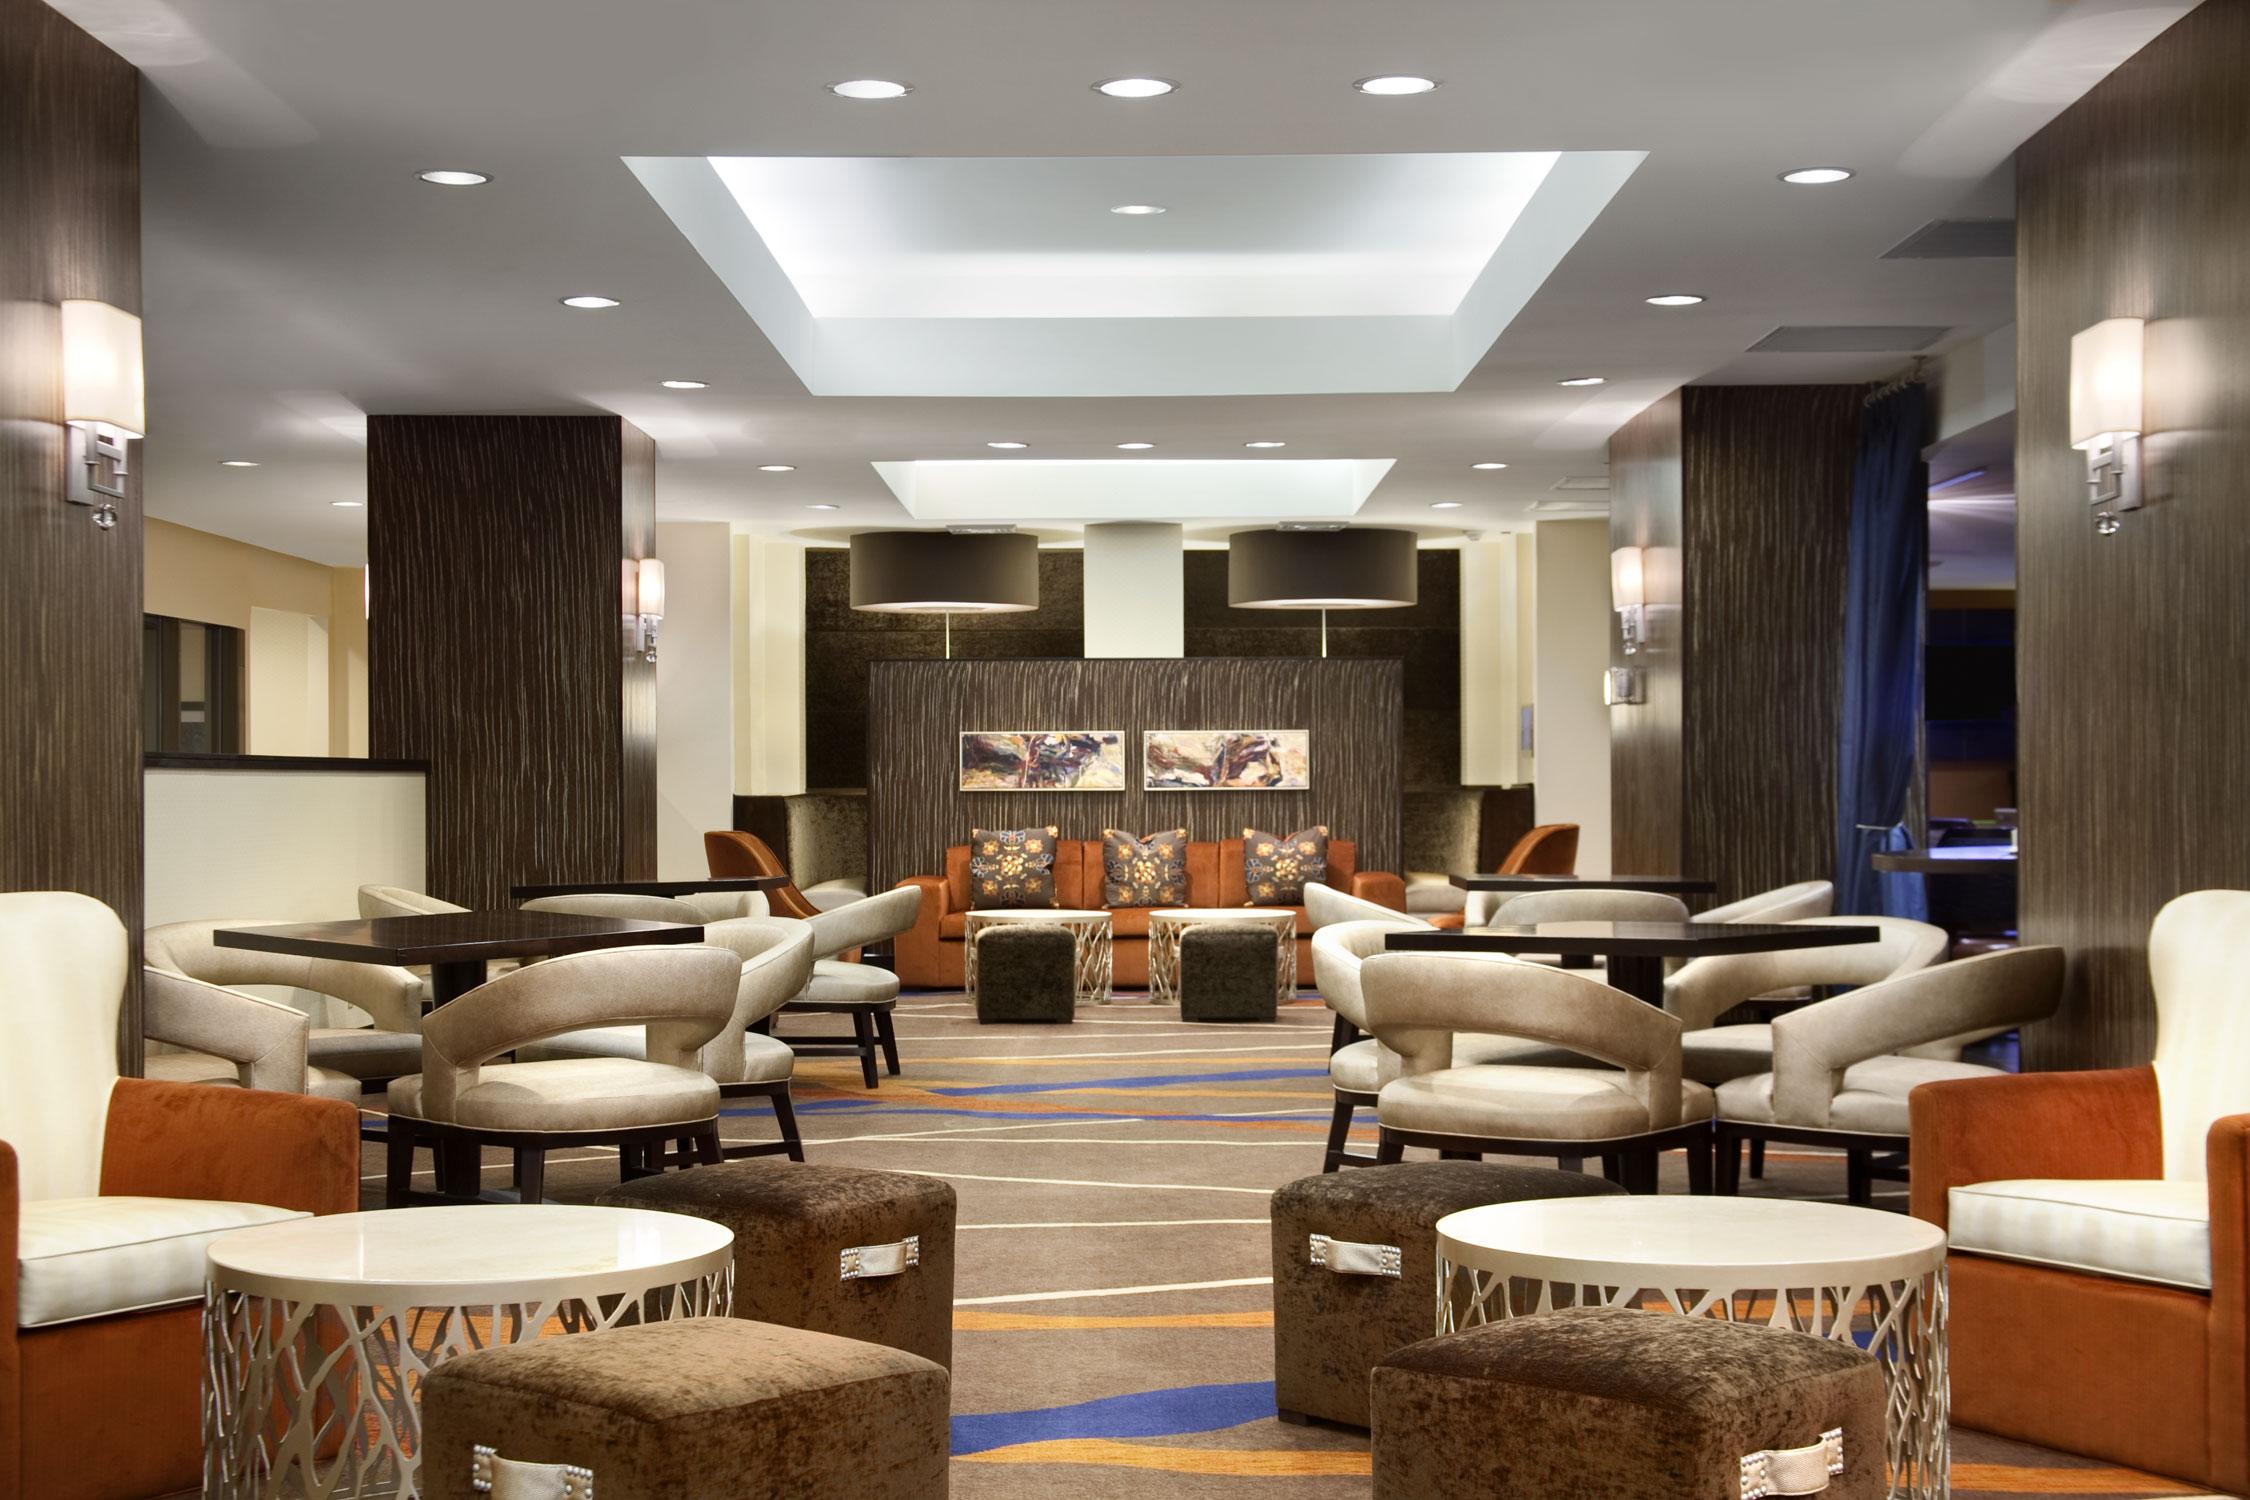 Lobby area of Hilton JFK Airporty